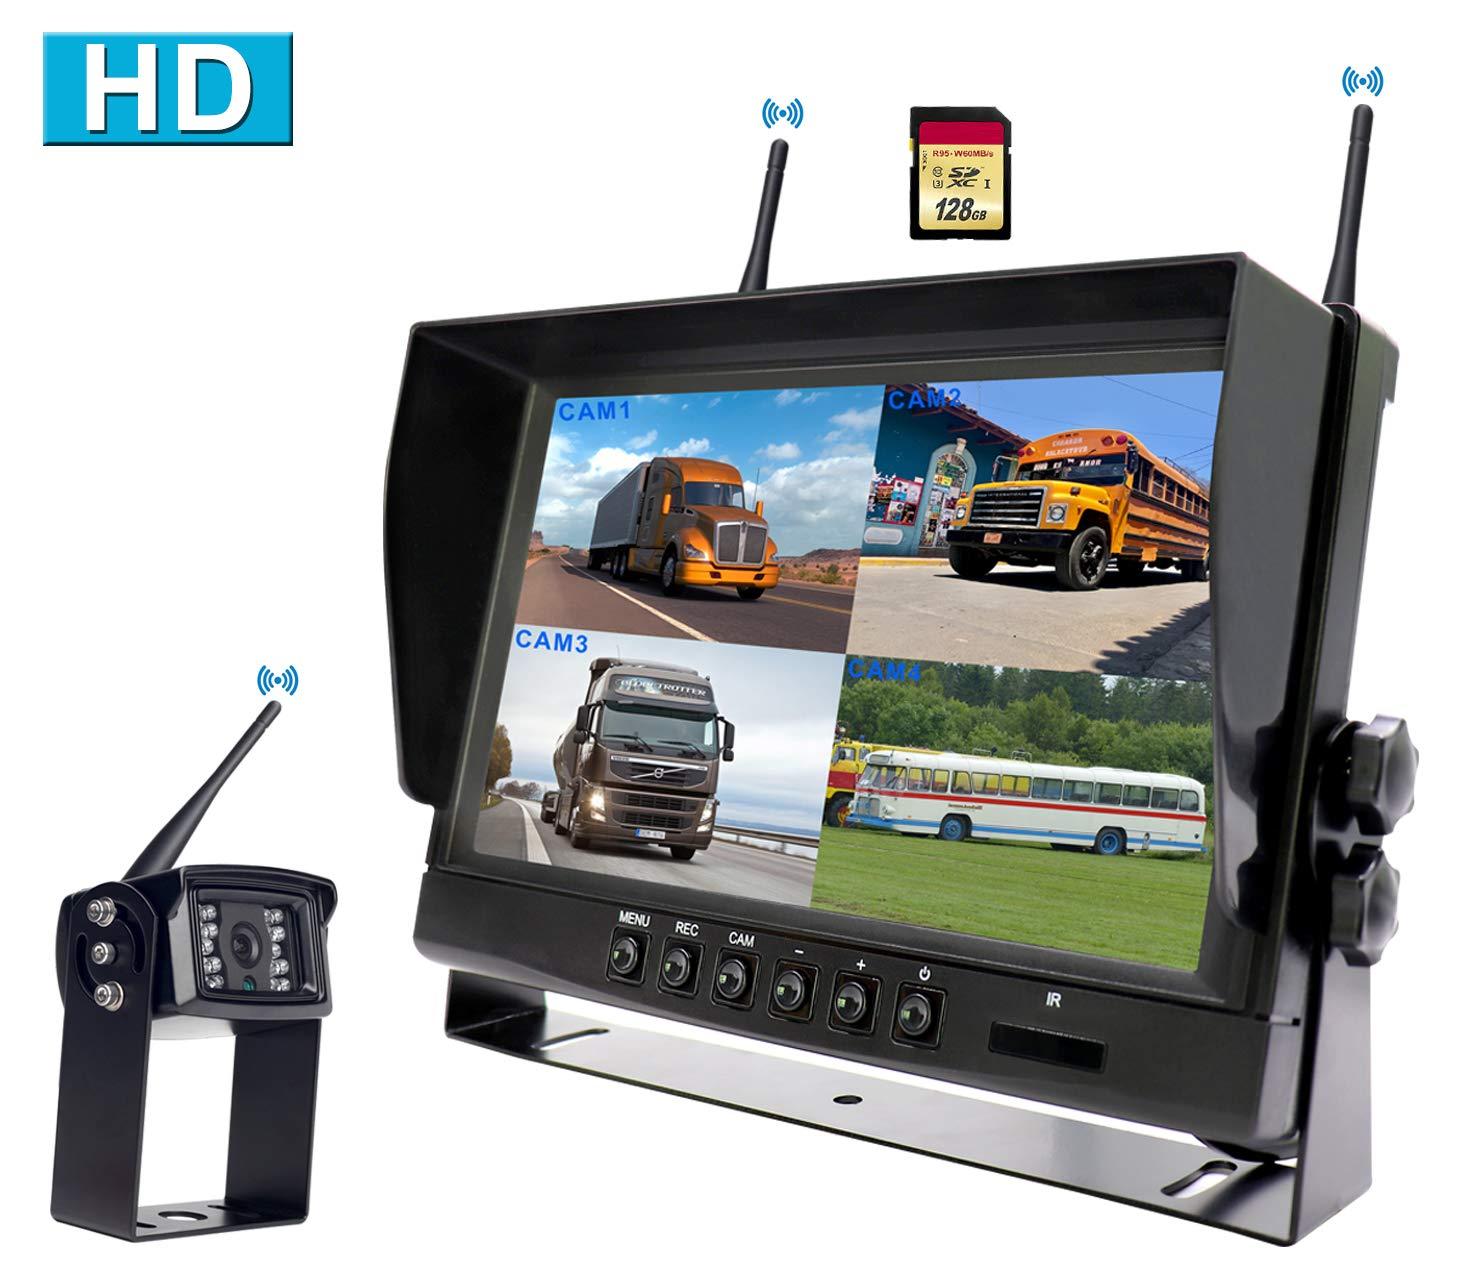 CAMONS Digital Wireless Monitor Waterproof